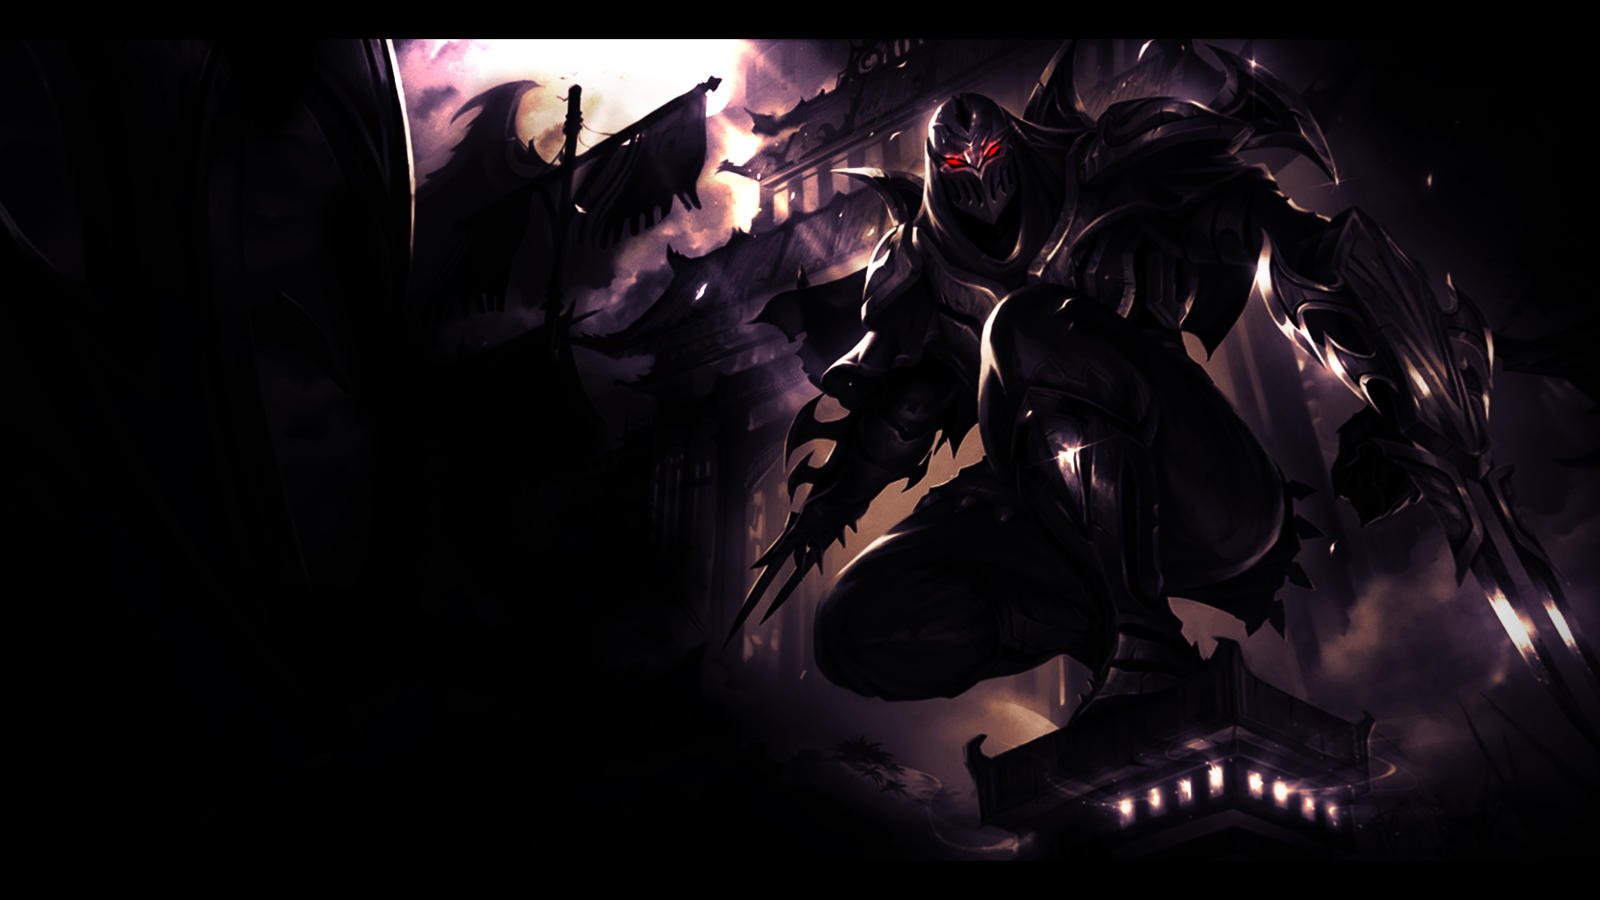 The Unseen Blade is the Deadliest - League of Legends Community